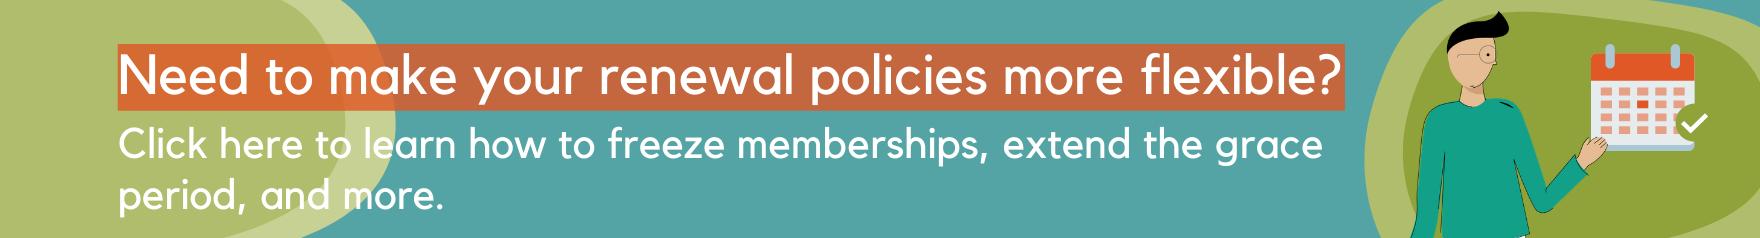 Member renewal flexibility banner